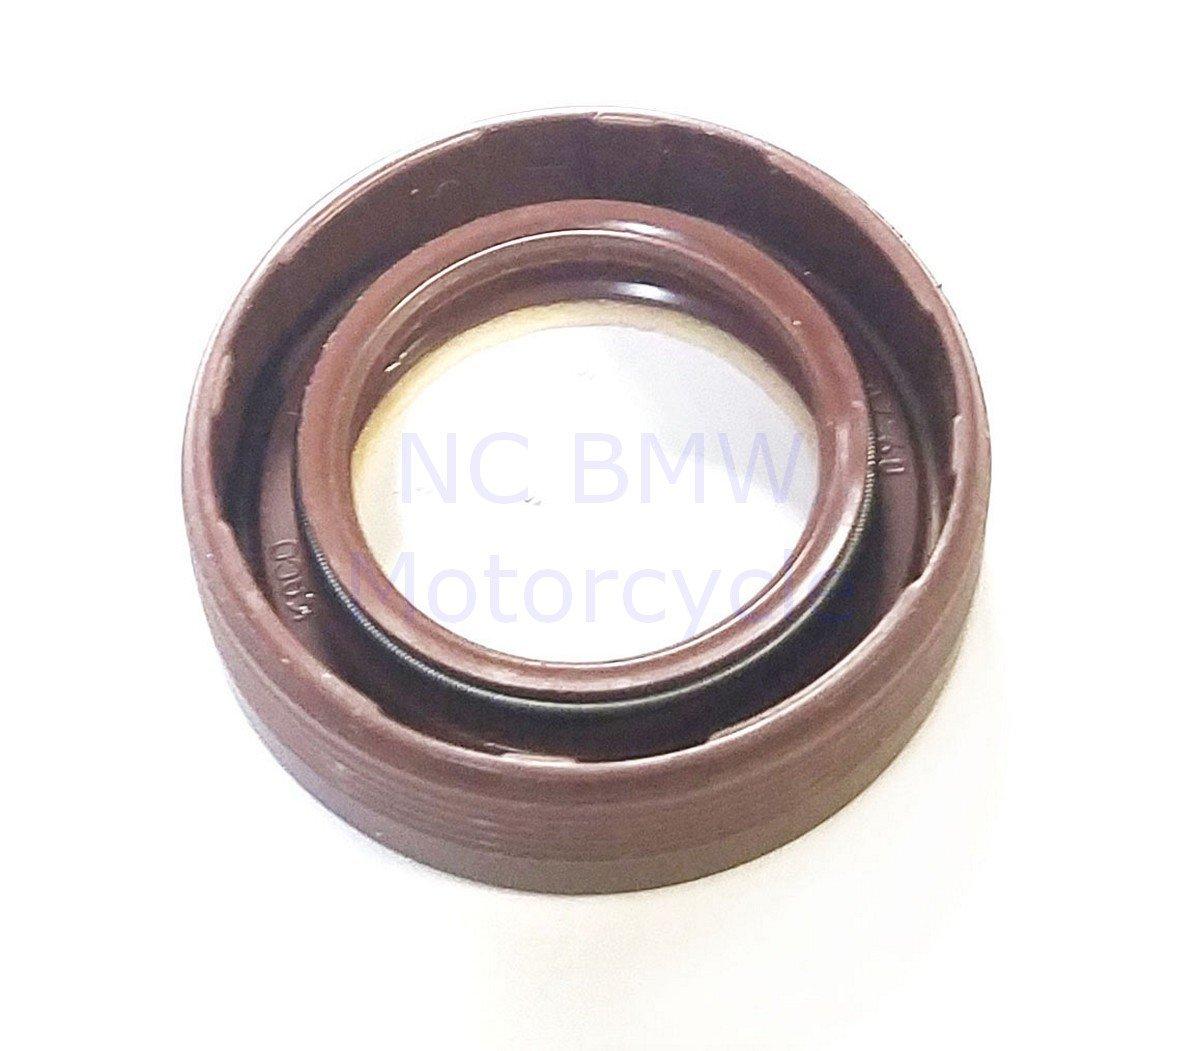 BMW Genuine Motorcycle Gearbox Tranmission Oil Seal Shaft Seal 20X32X8 R1100S R1200C R1200 Montauk R1200C Independent K1200LT K1200RS R nine T R1200GS R1200GS Adventure HP2 Enduro HP2 Megamoto R1200RT